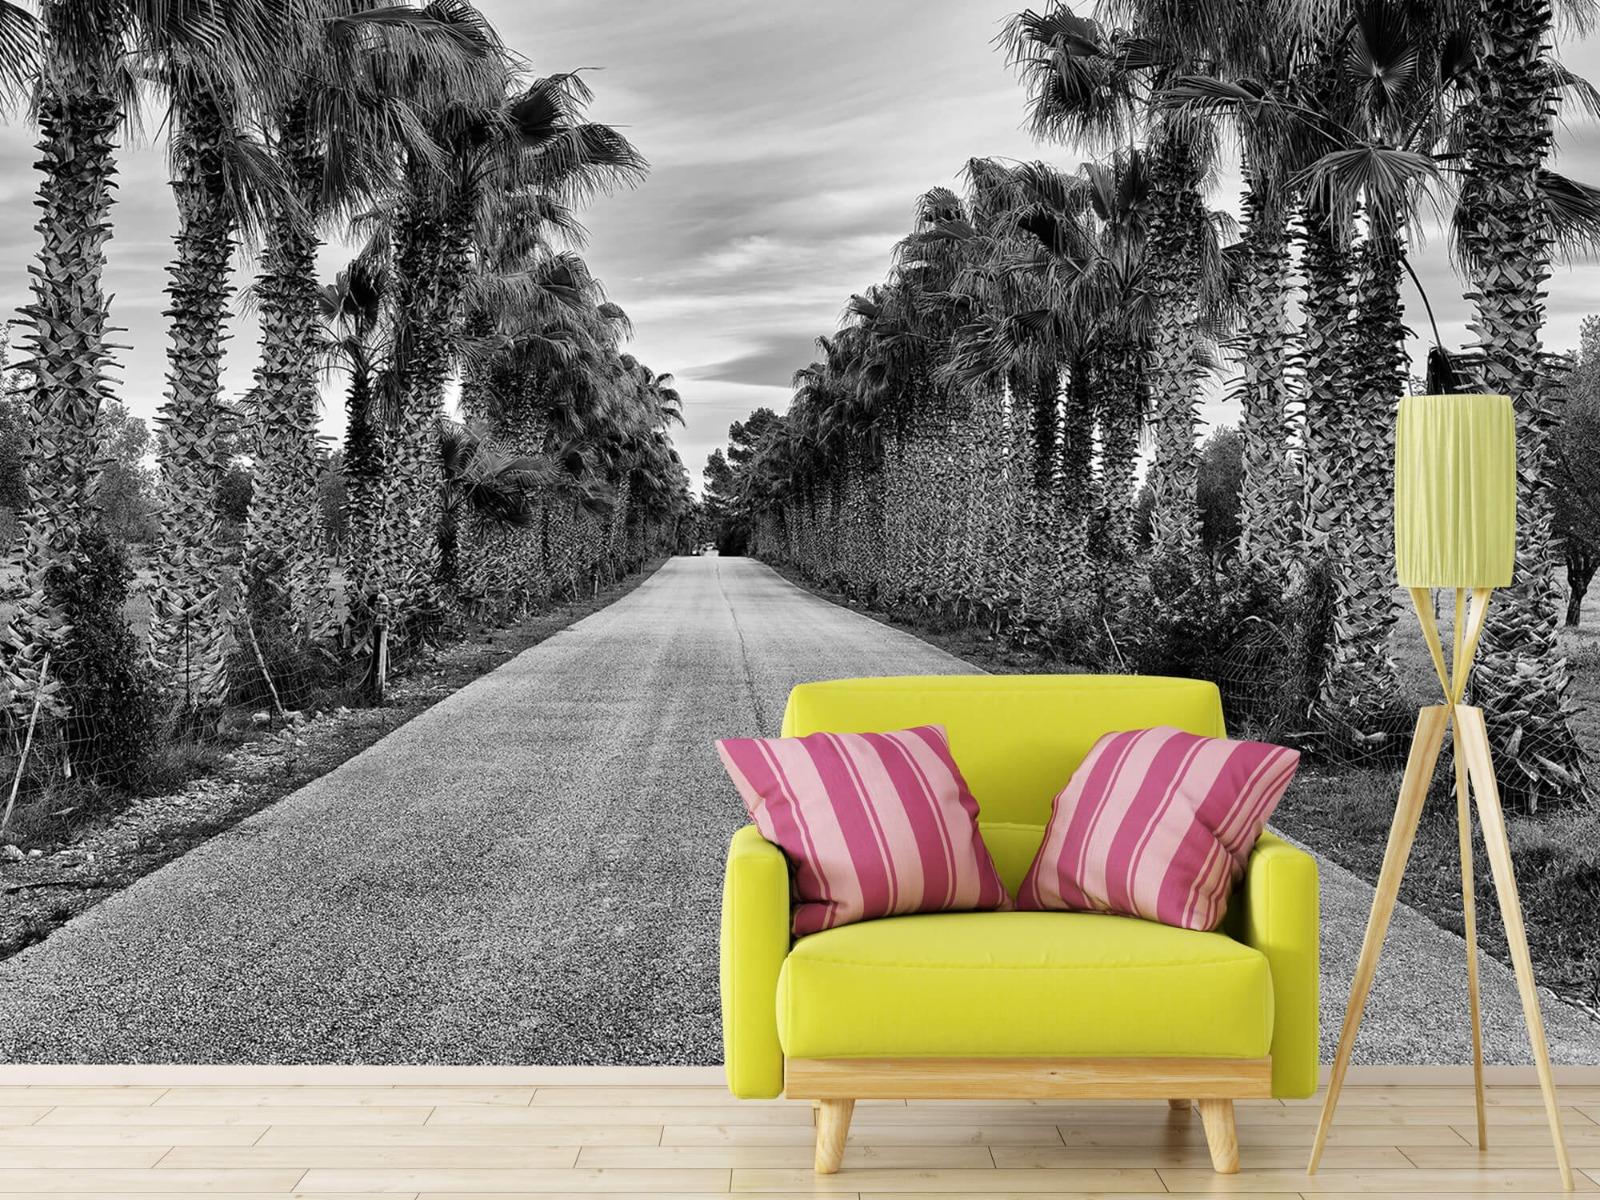 Palmbomen - Straat met palmbomen - Woonkamer 17